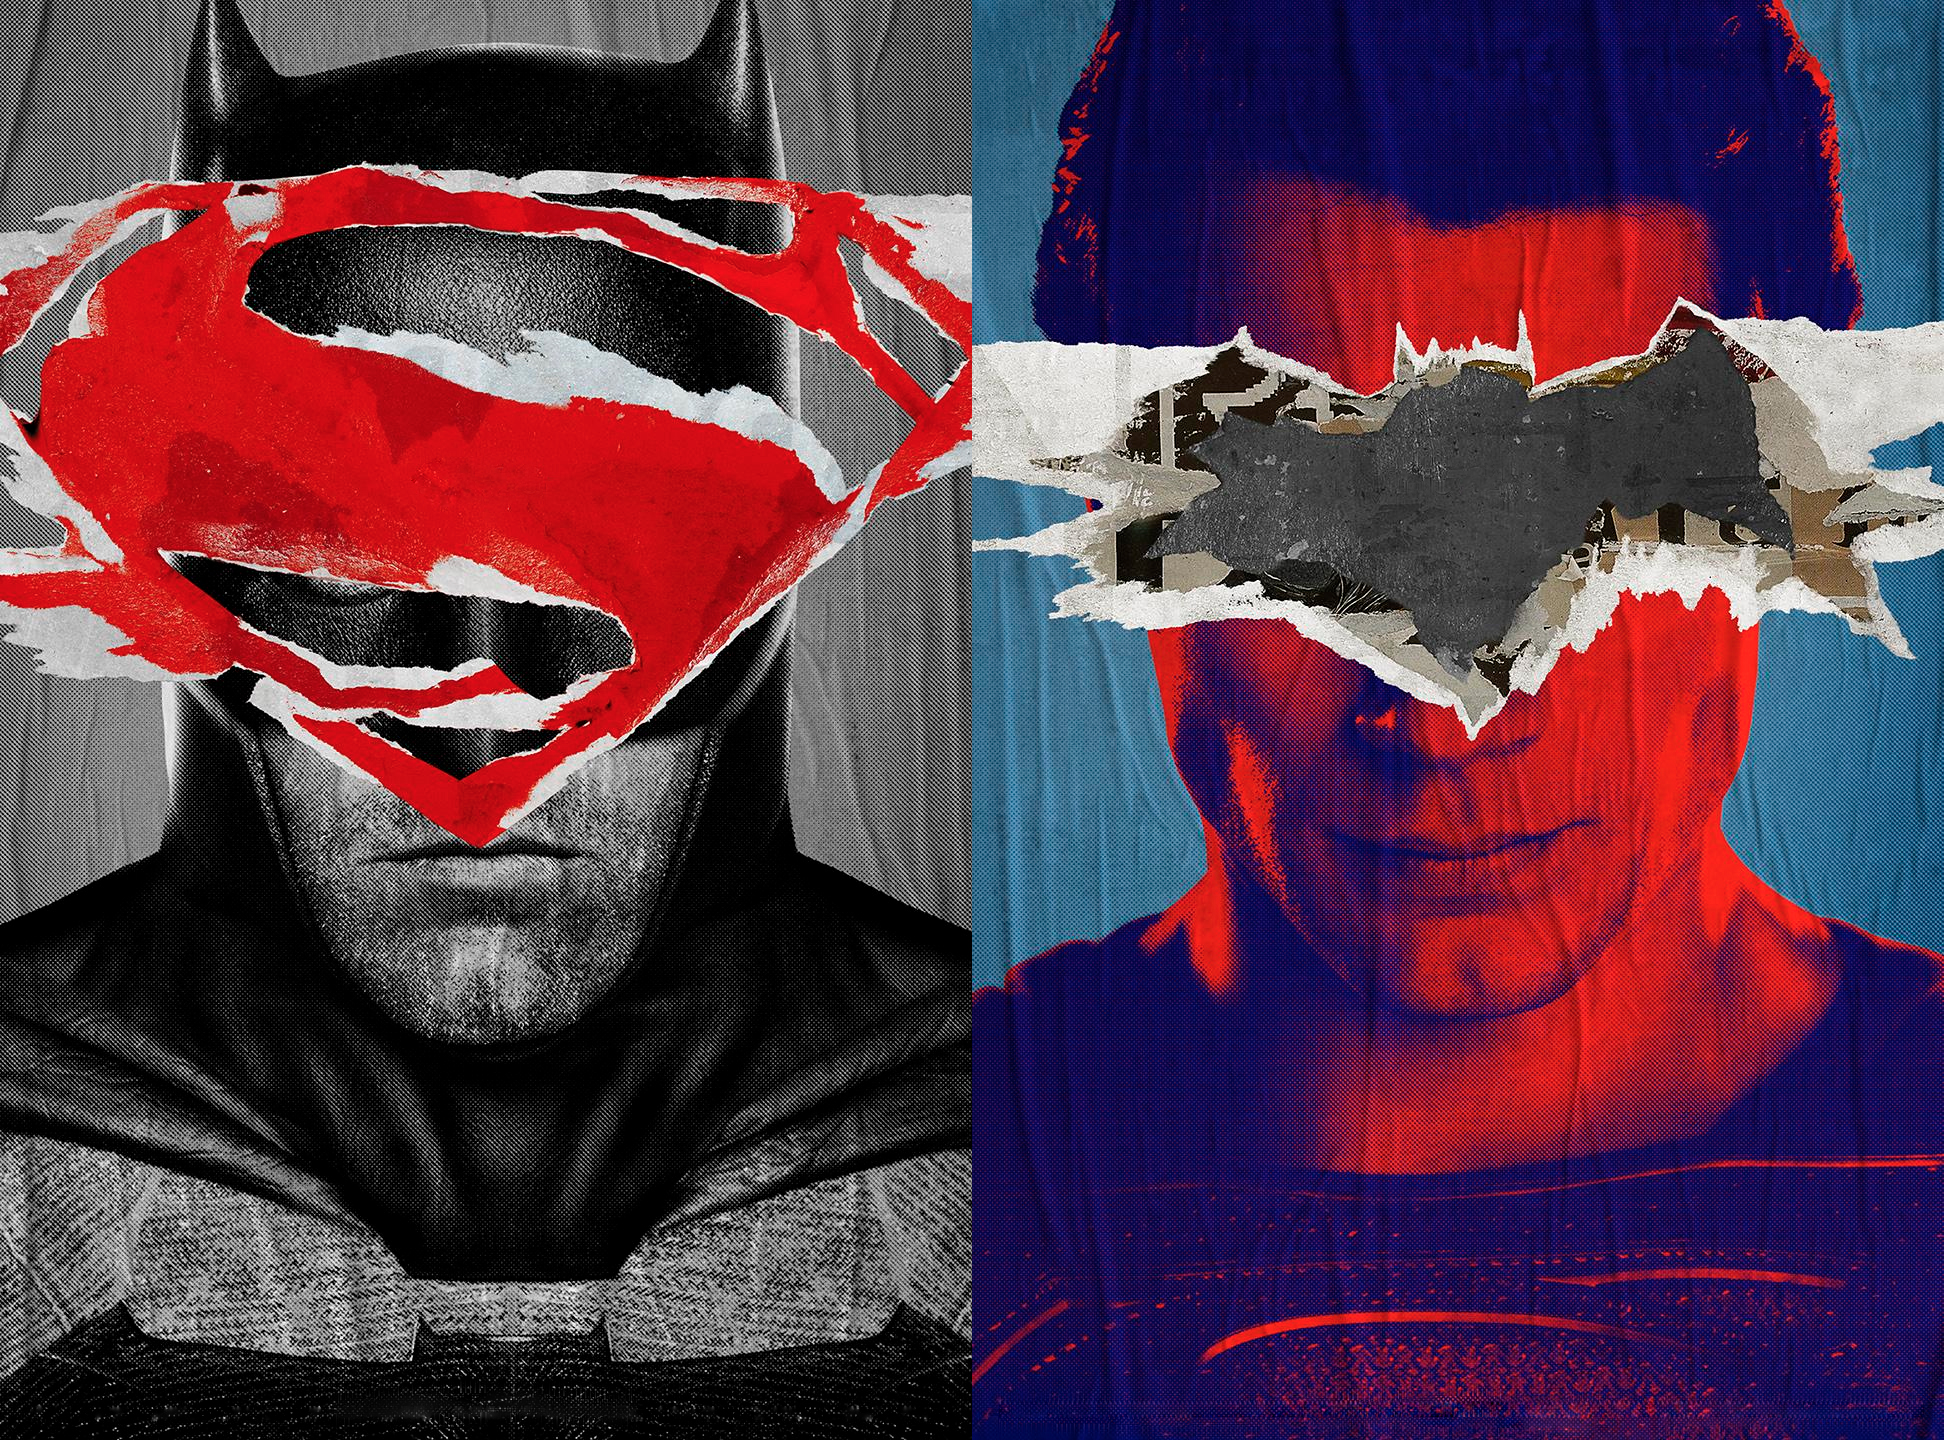 batman vs superman logo hd wallpapers - drive.cheapusedmotorhome